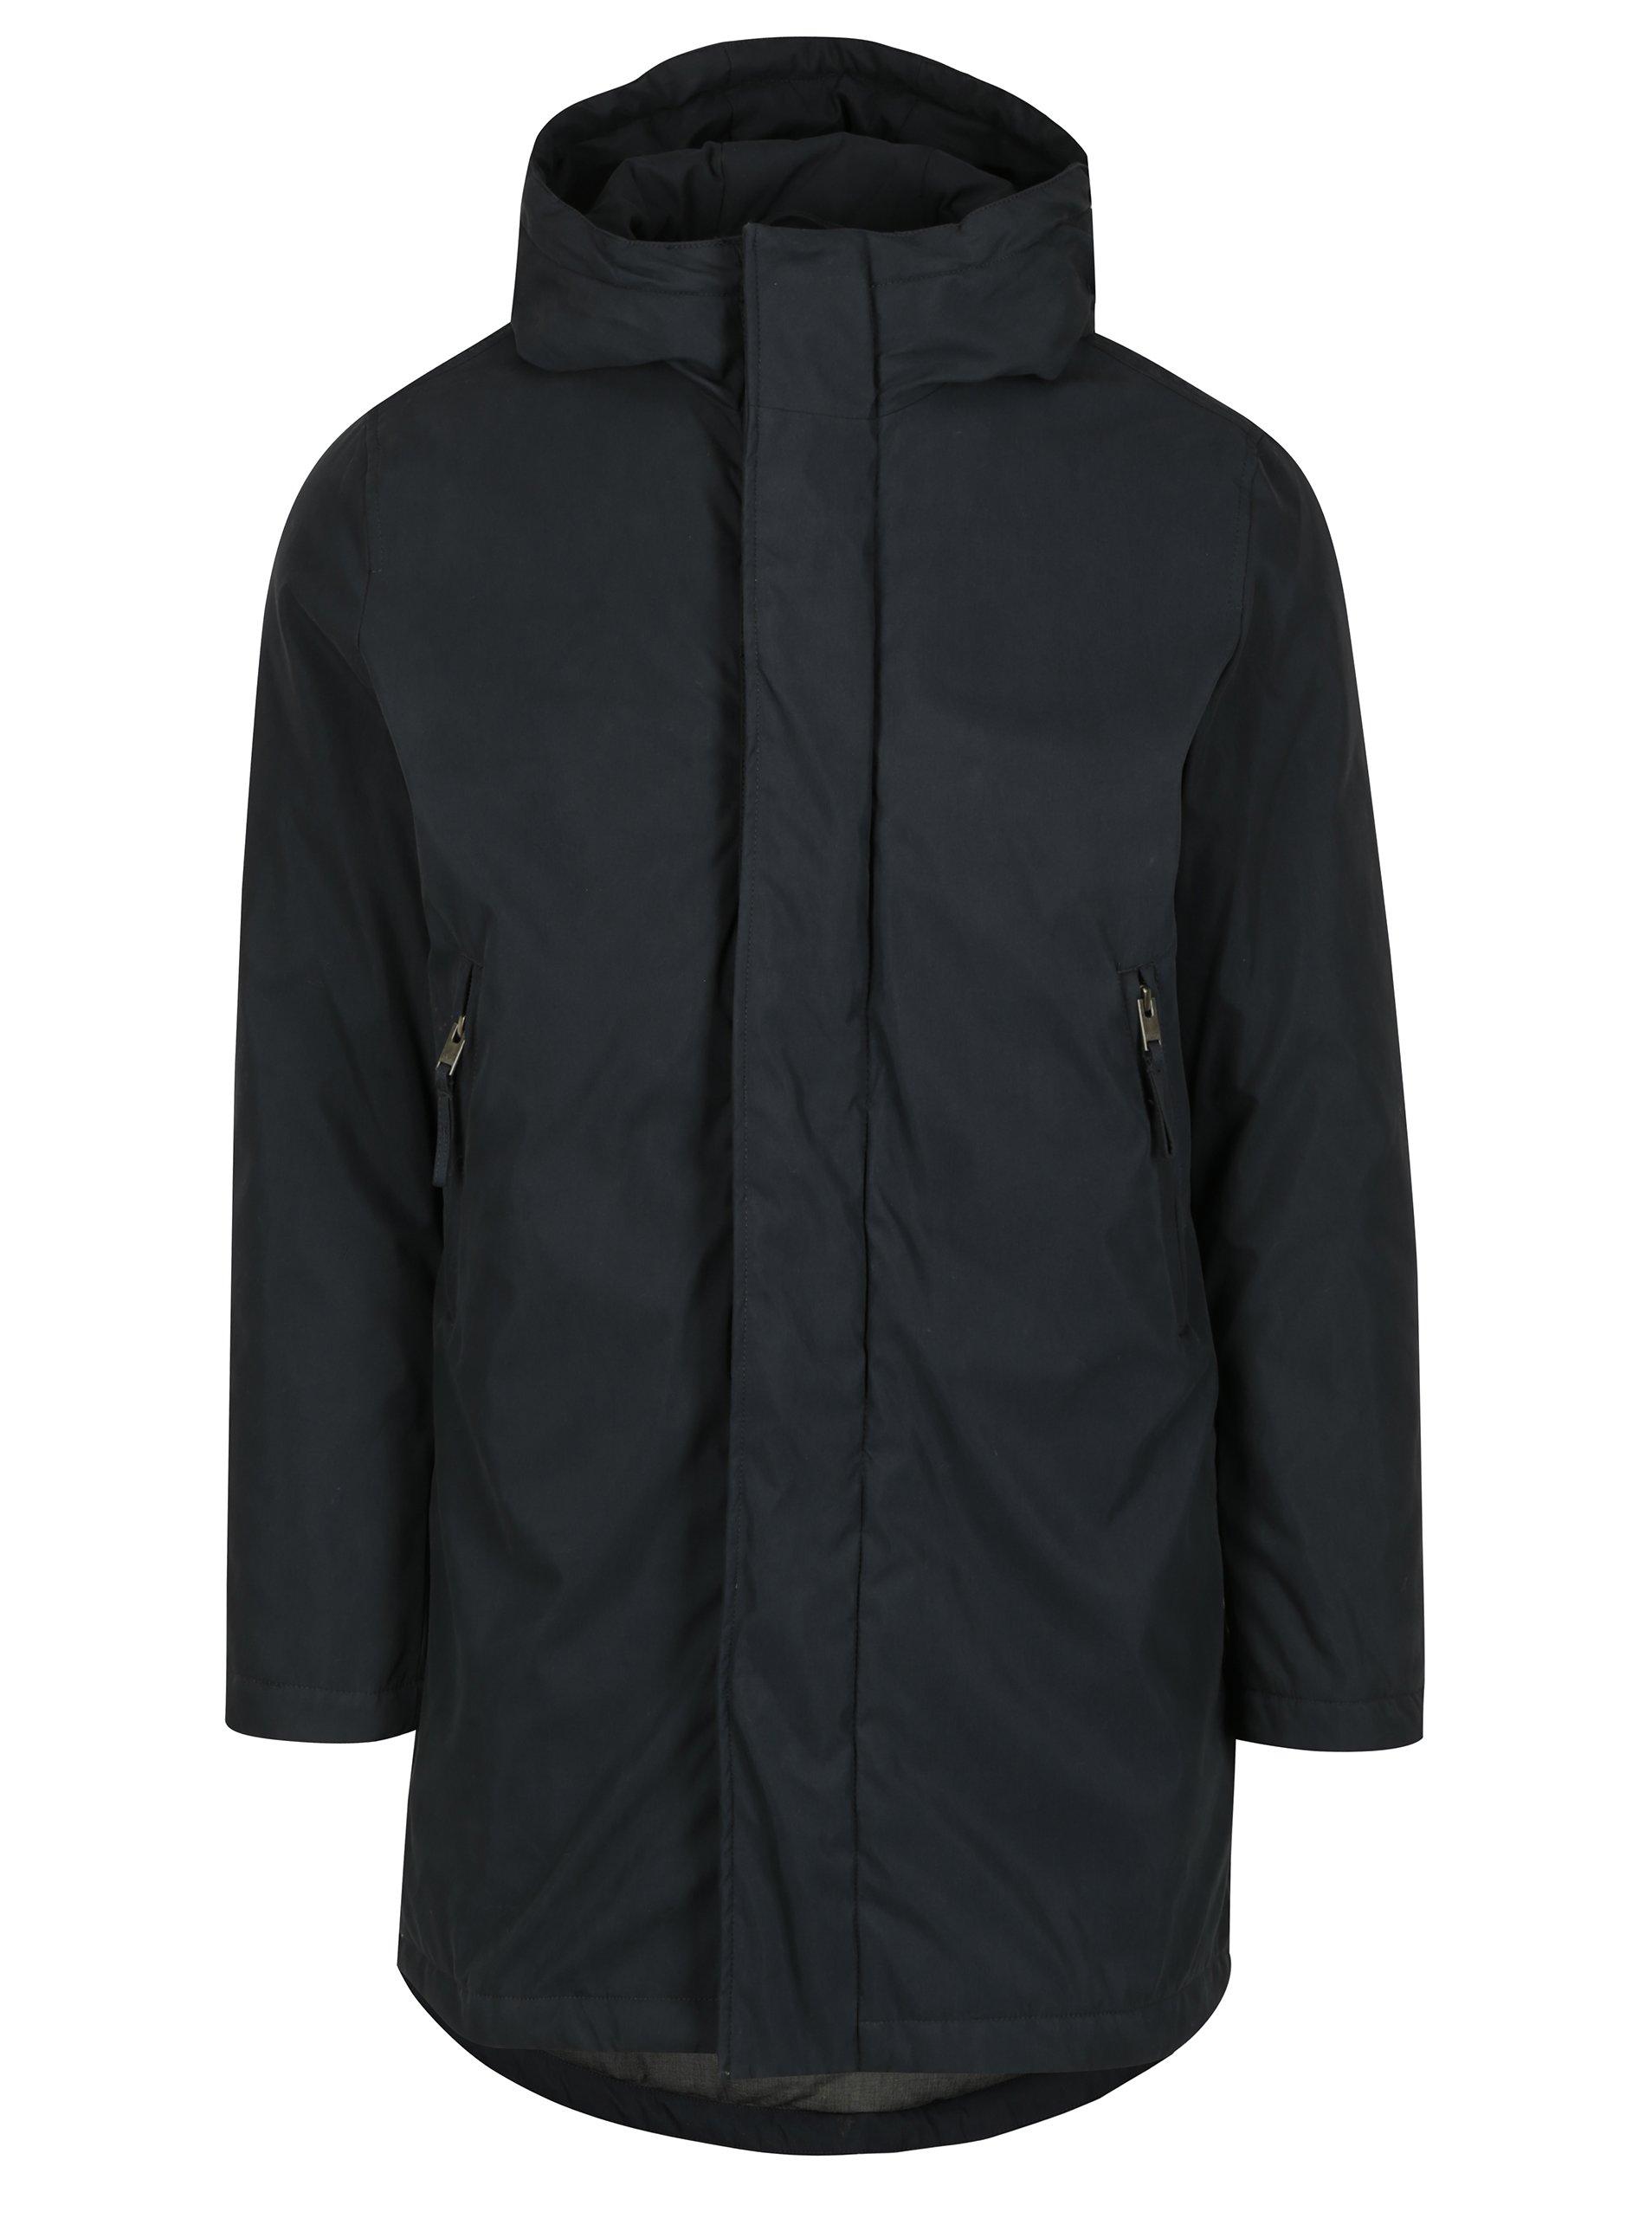 Tmavomodrá zimná bunda Selected Homme Jason